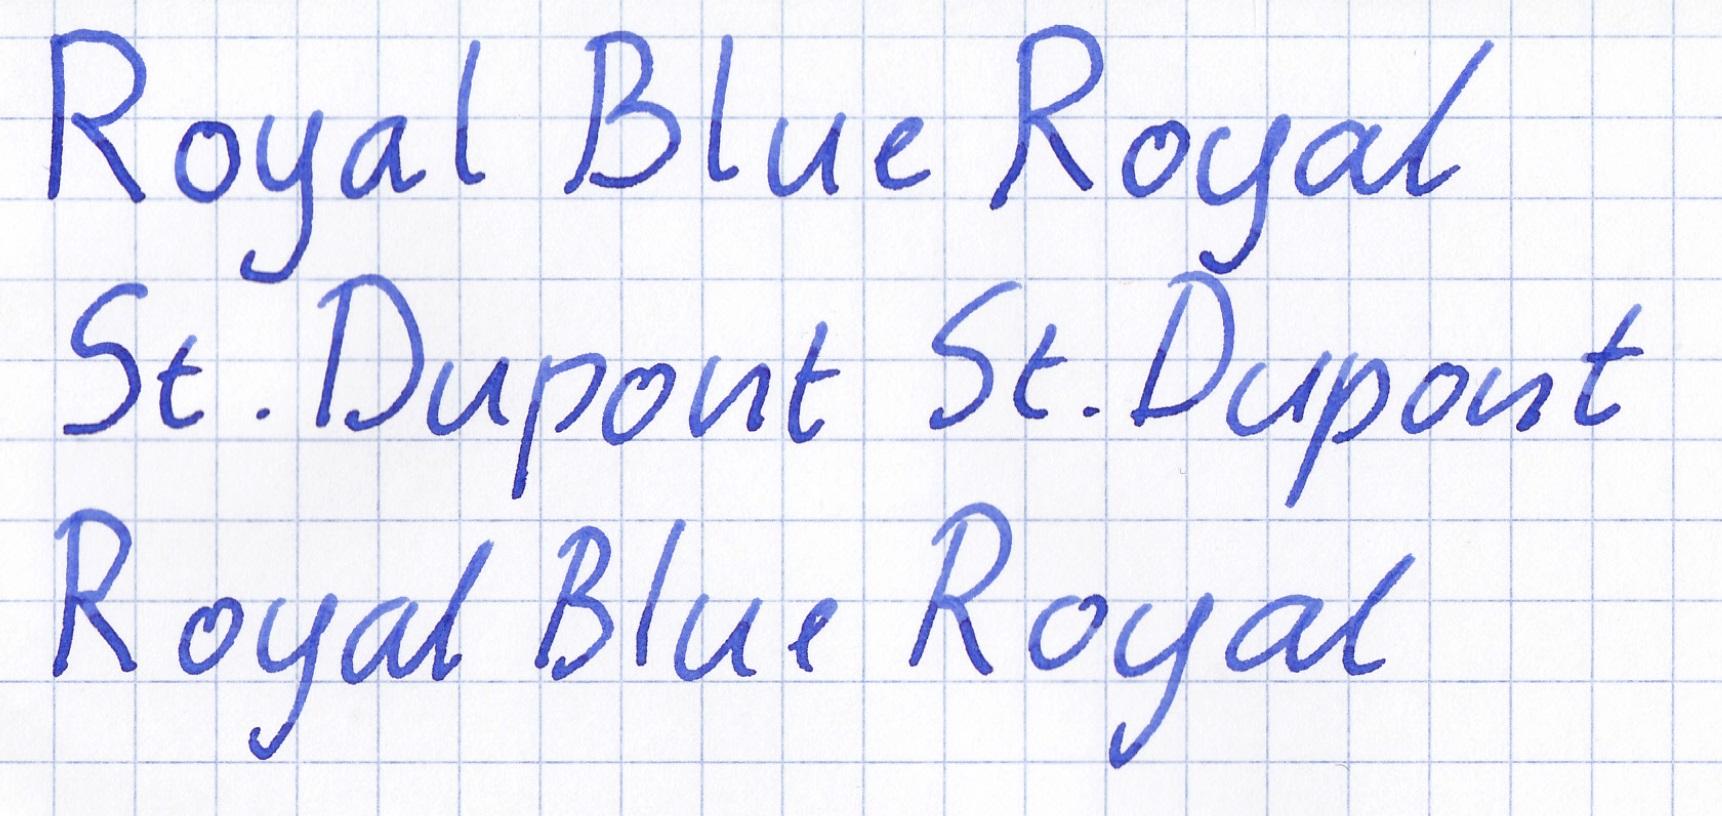 fpn_1460132268__royalblue_stdupont_ox_1.